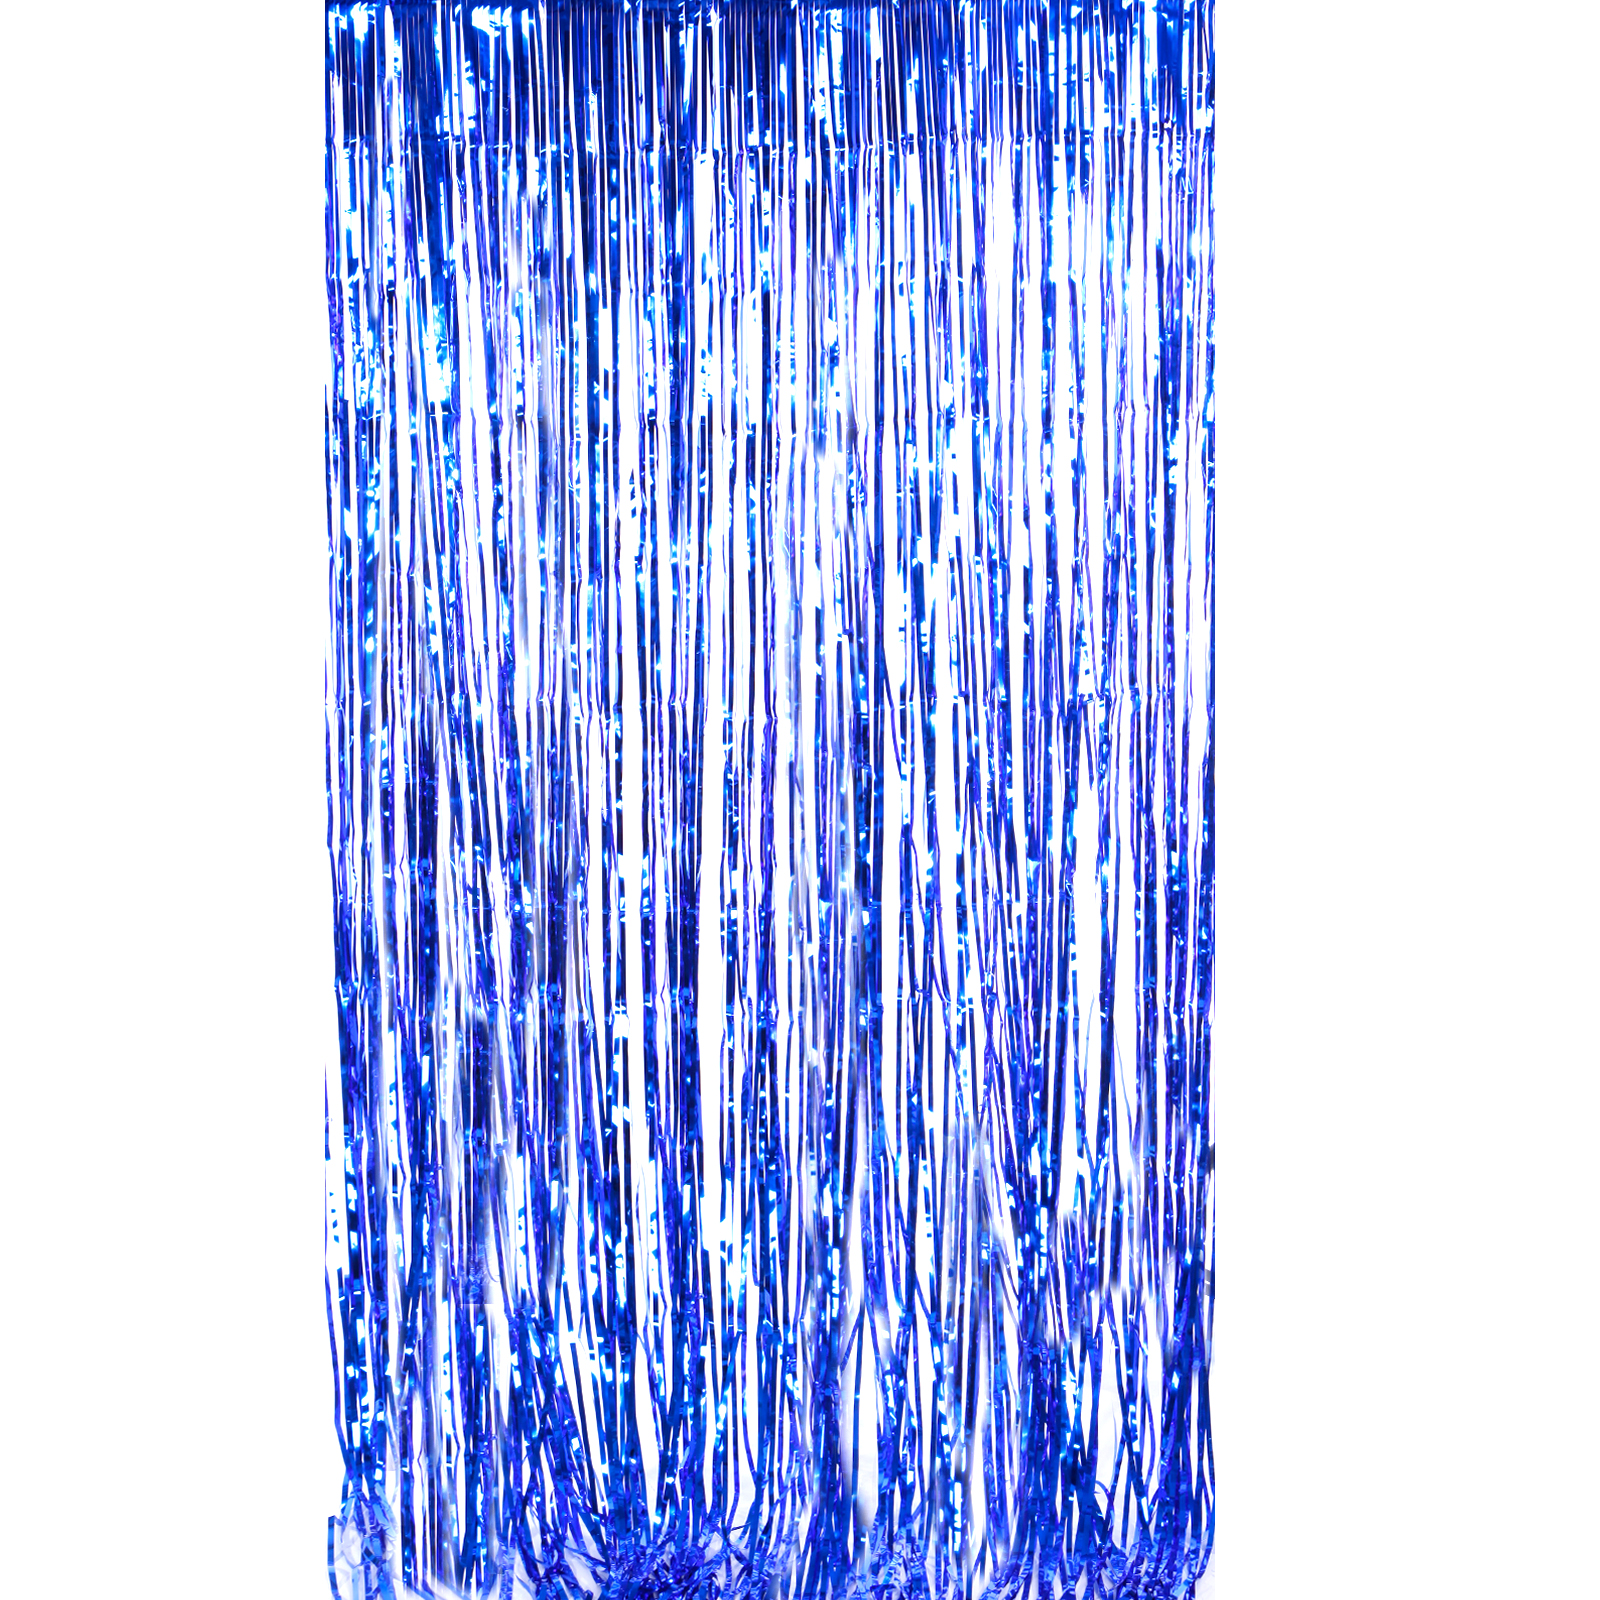 Shimmer Foil Glitter Metallic Backdrop Tinsel Curtain Fringe